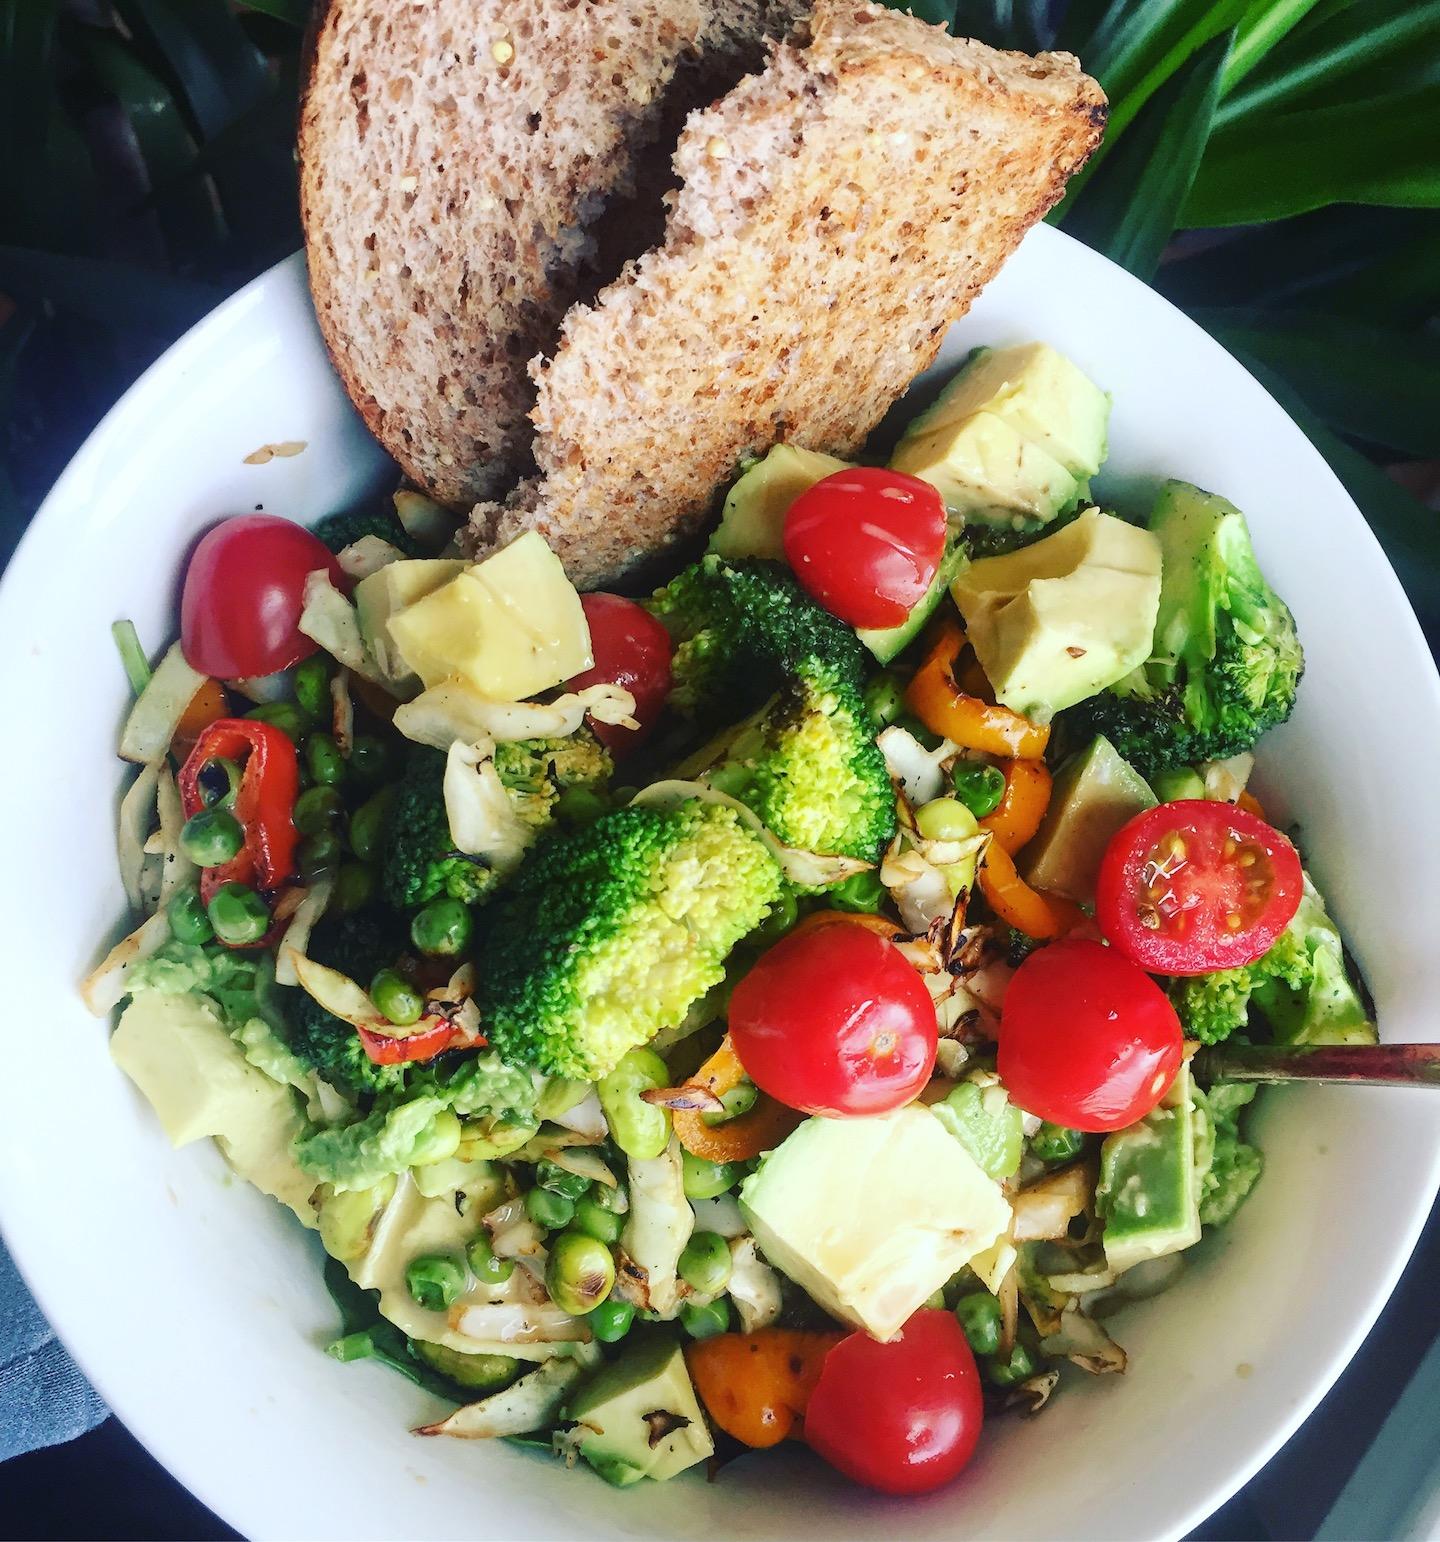 Big salads with nutrient dense vegetables